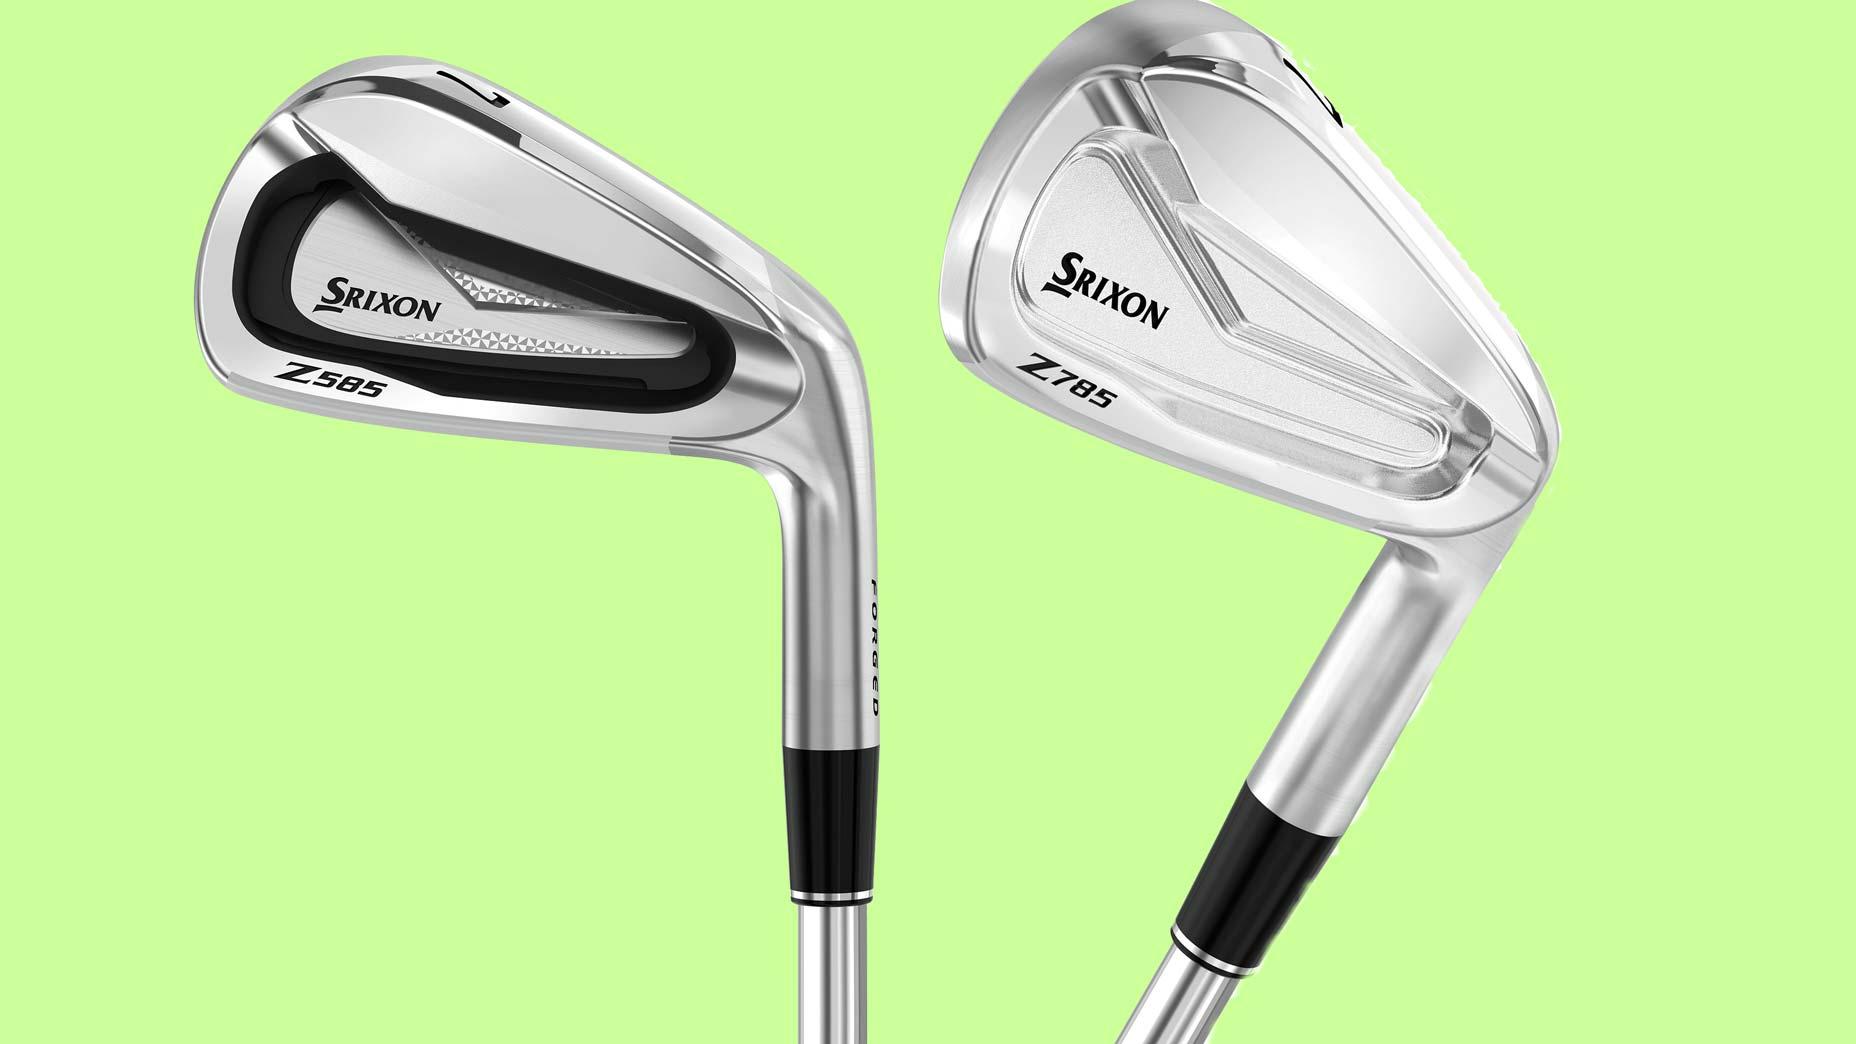 Srixon Z585 and Z785 irons